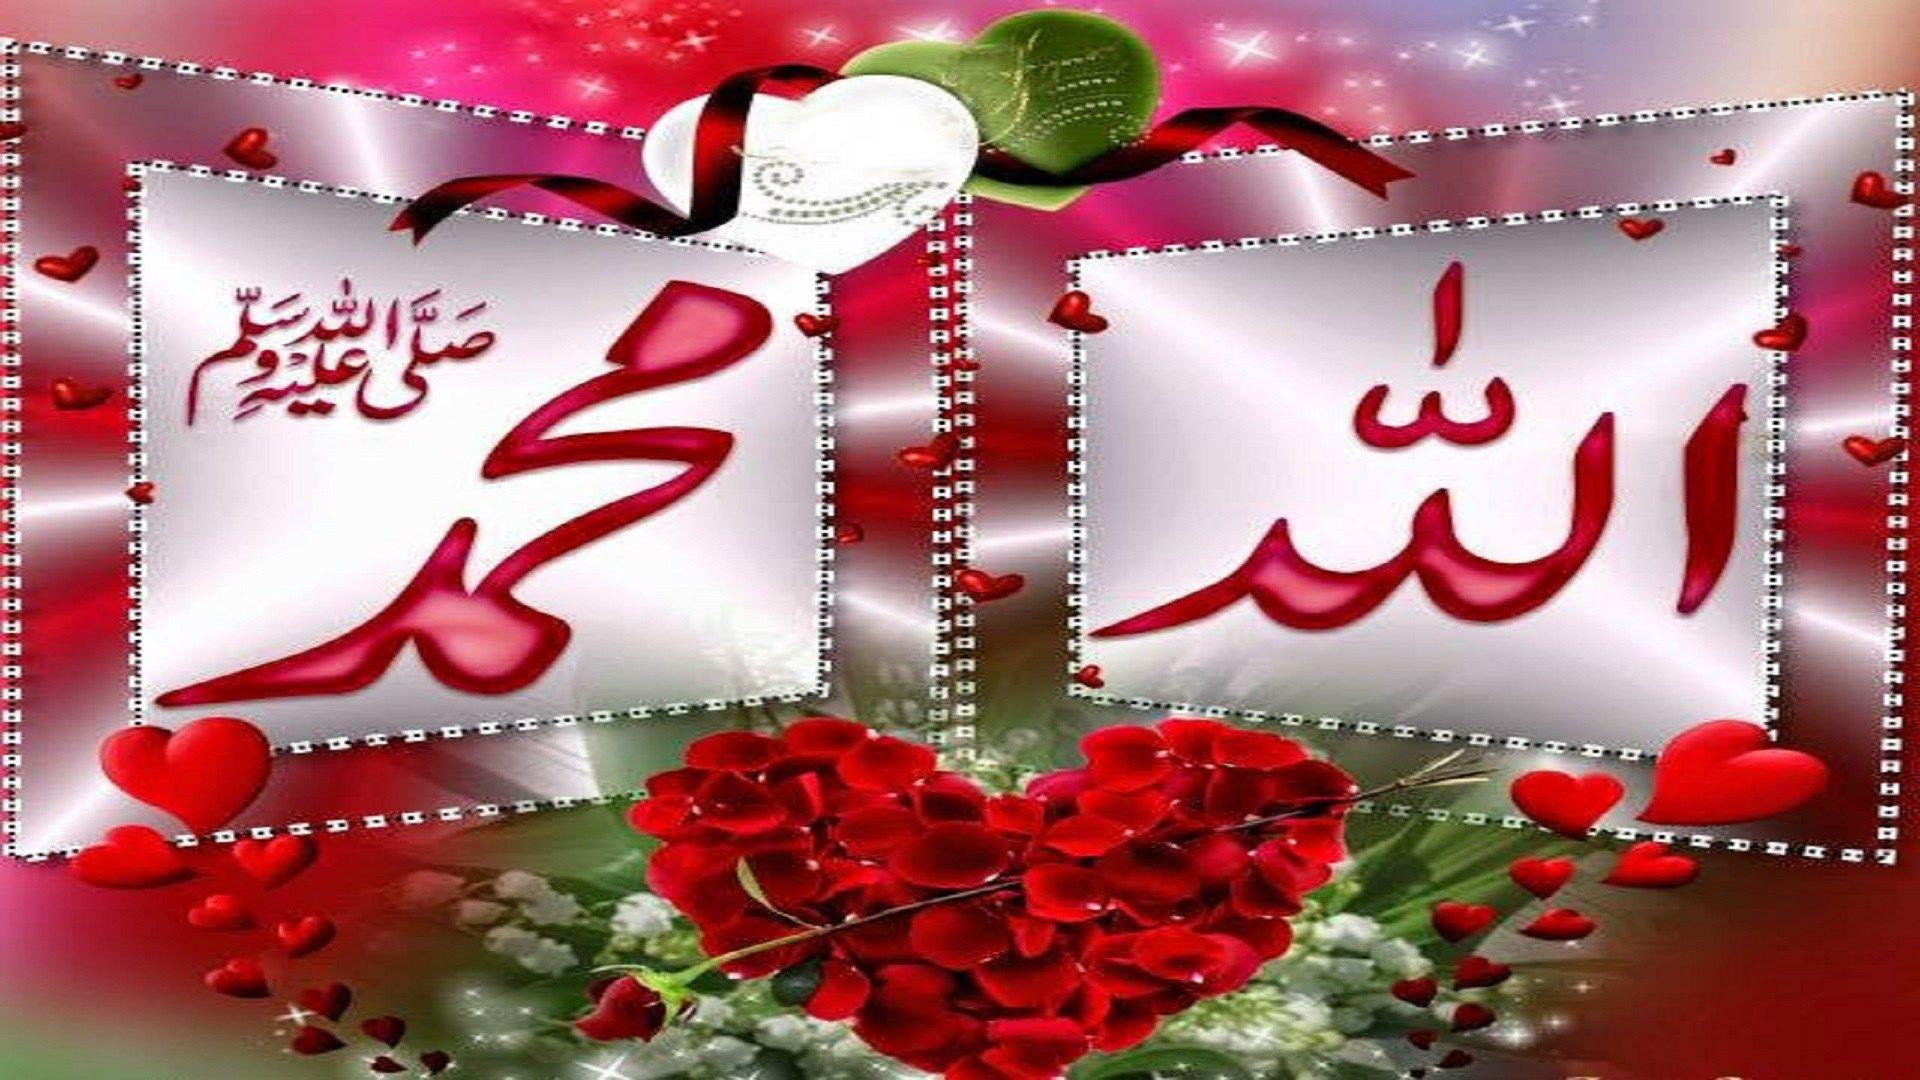 Allah Muhammad Wallpapers 3d  Wallpaper Cave